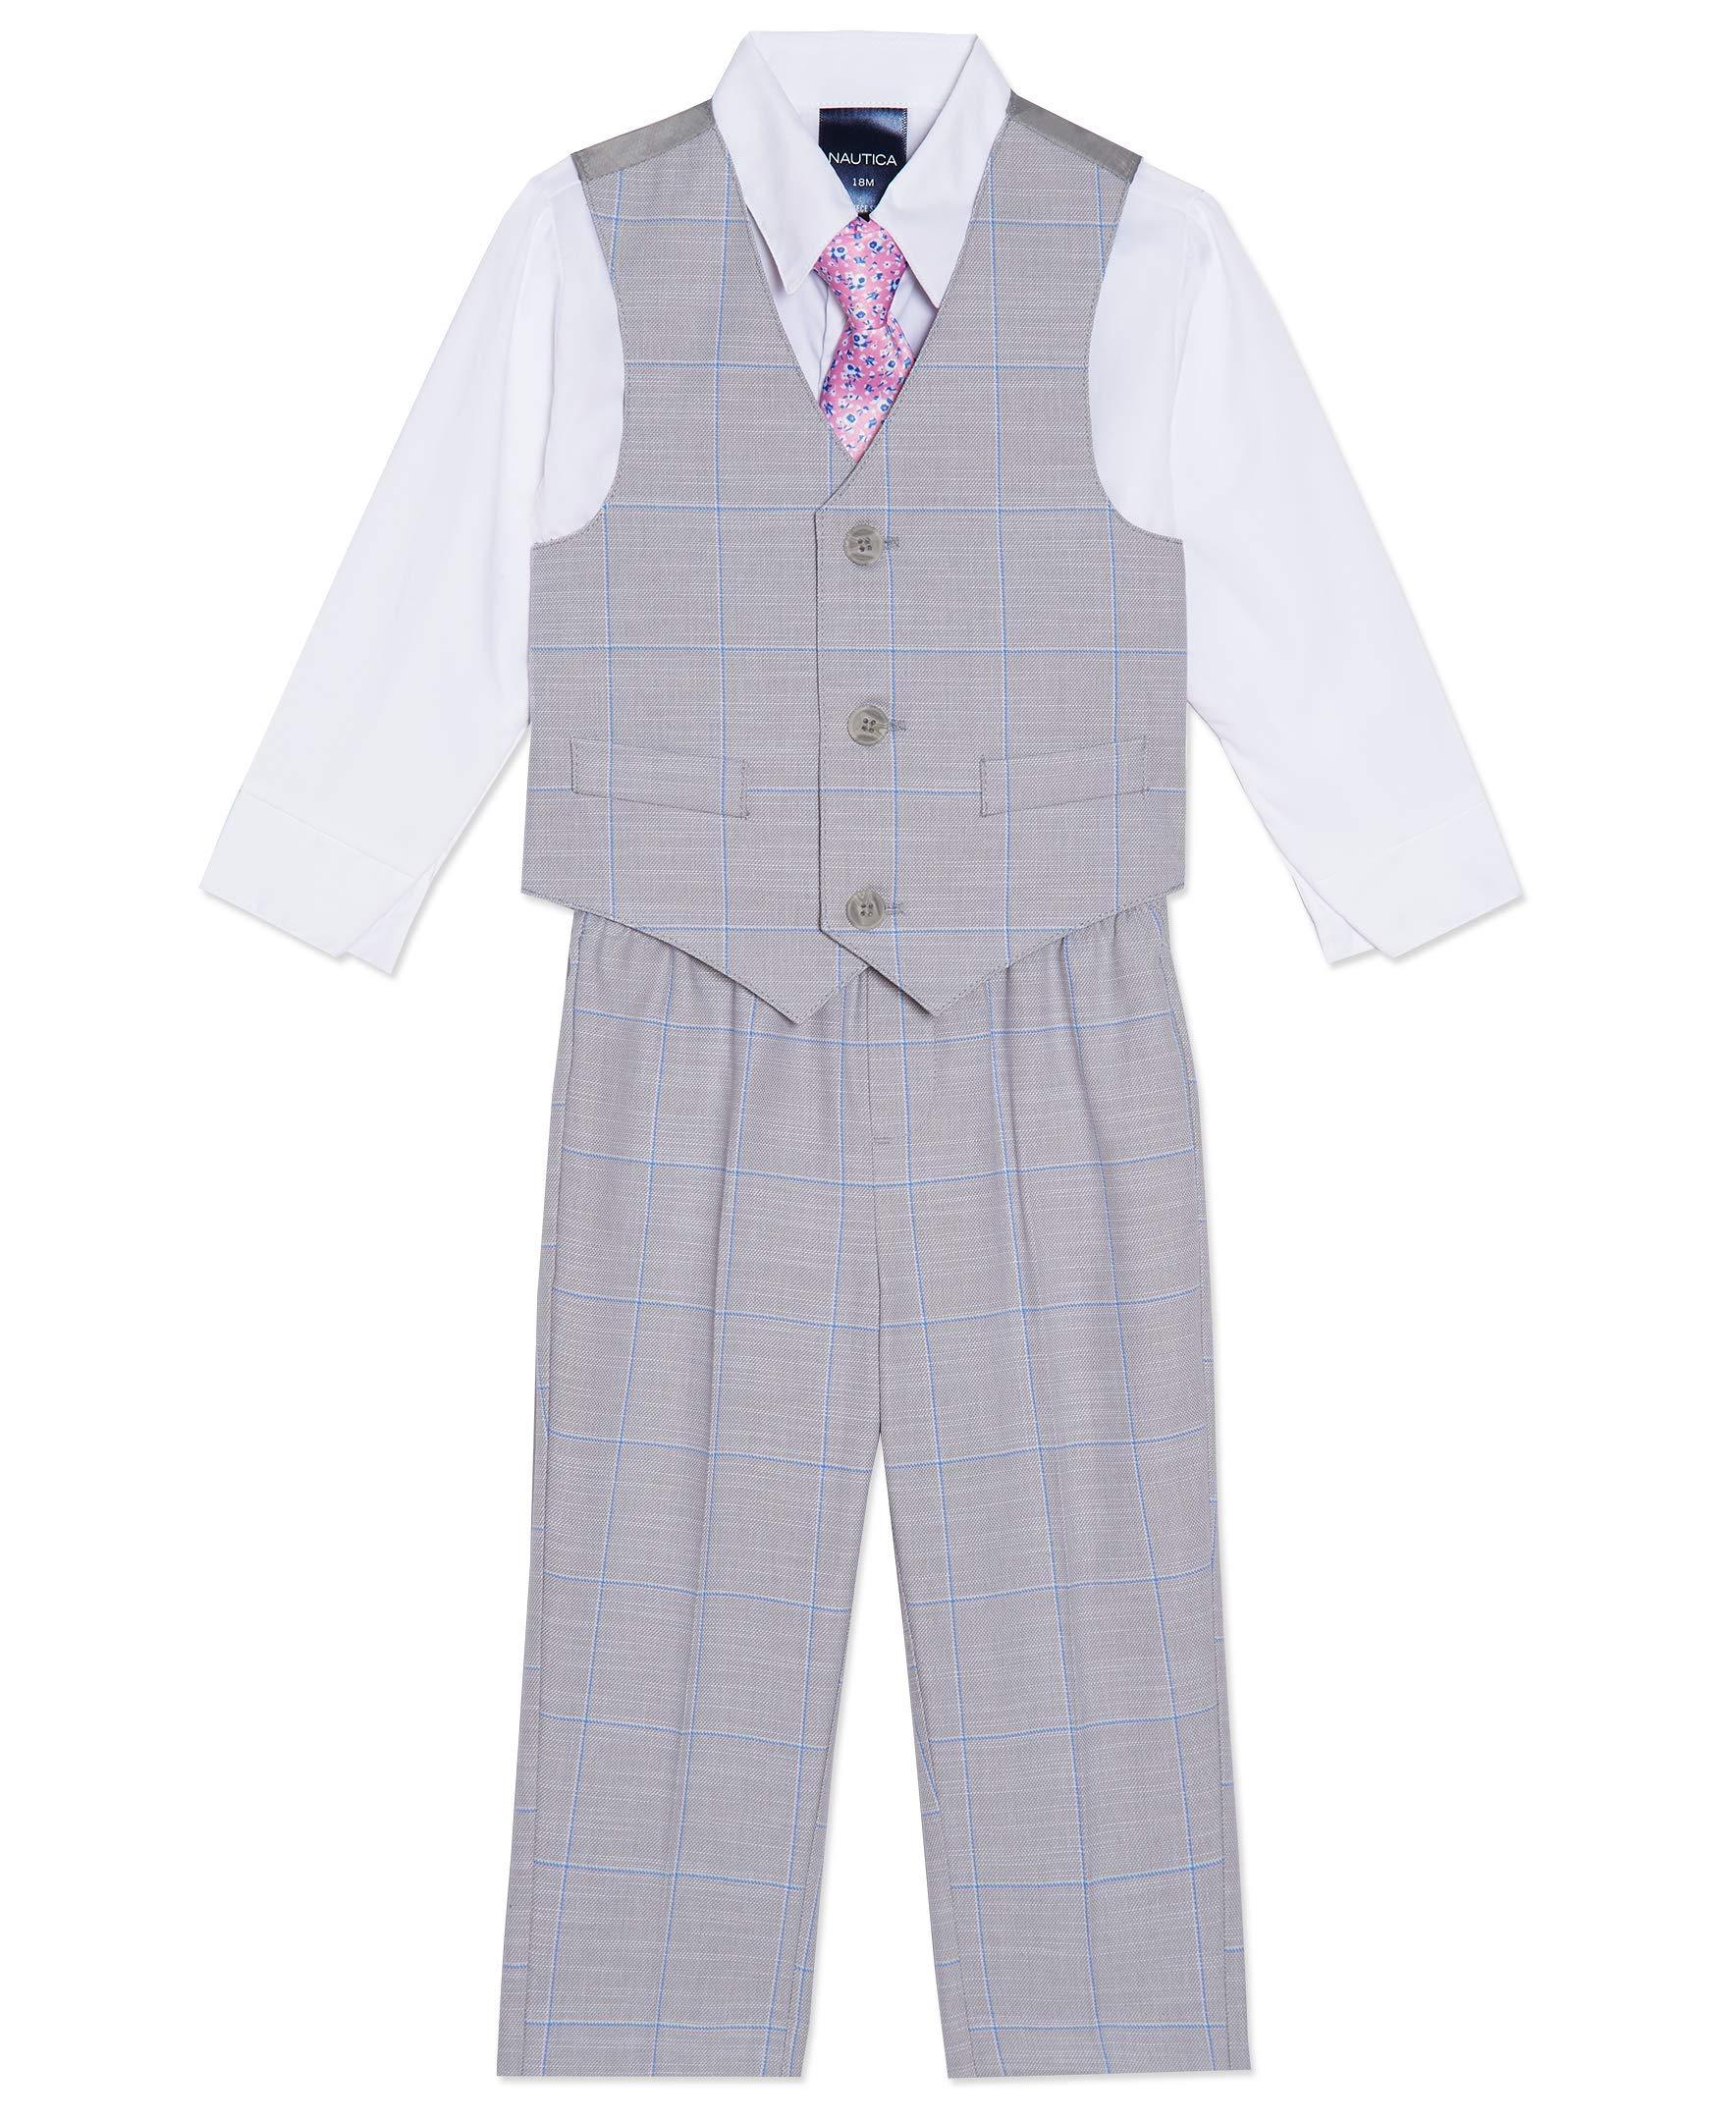 Nautica Baby Boys 4-Piece Set with Dress Shirt, Vest, Pants, and Tie